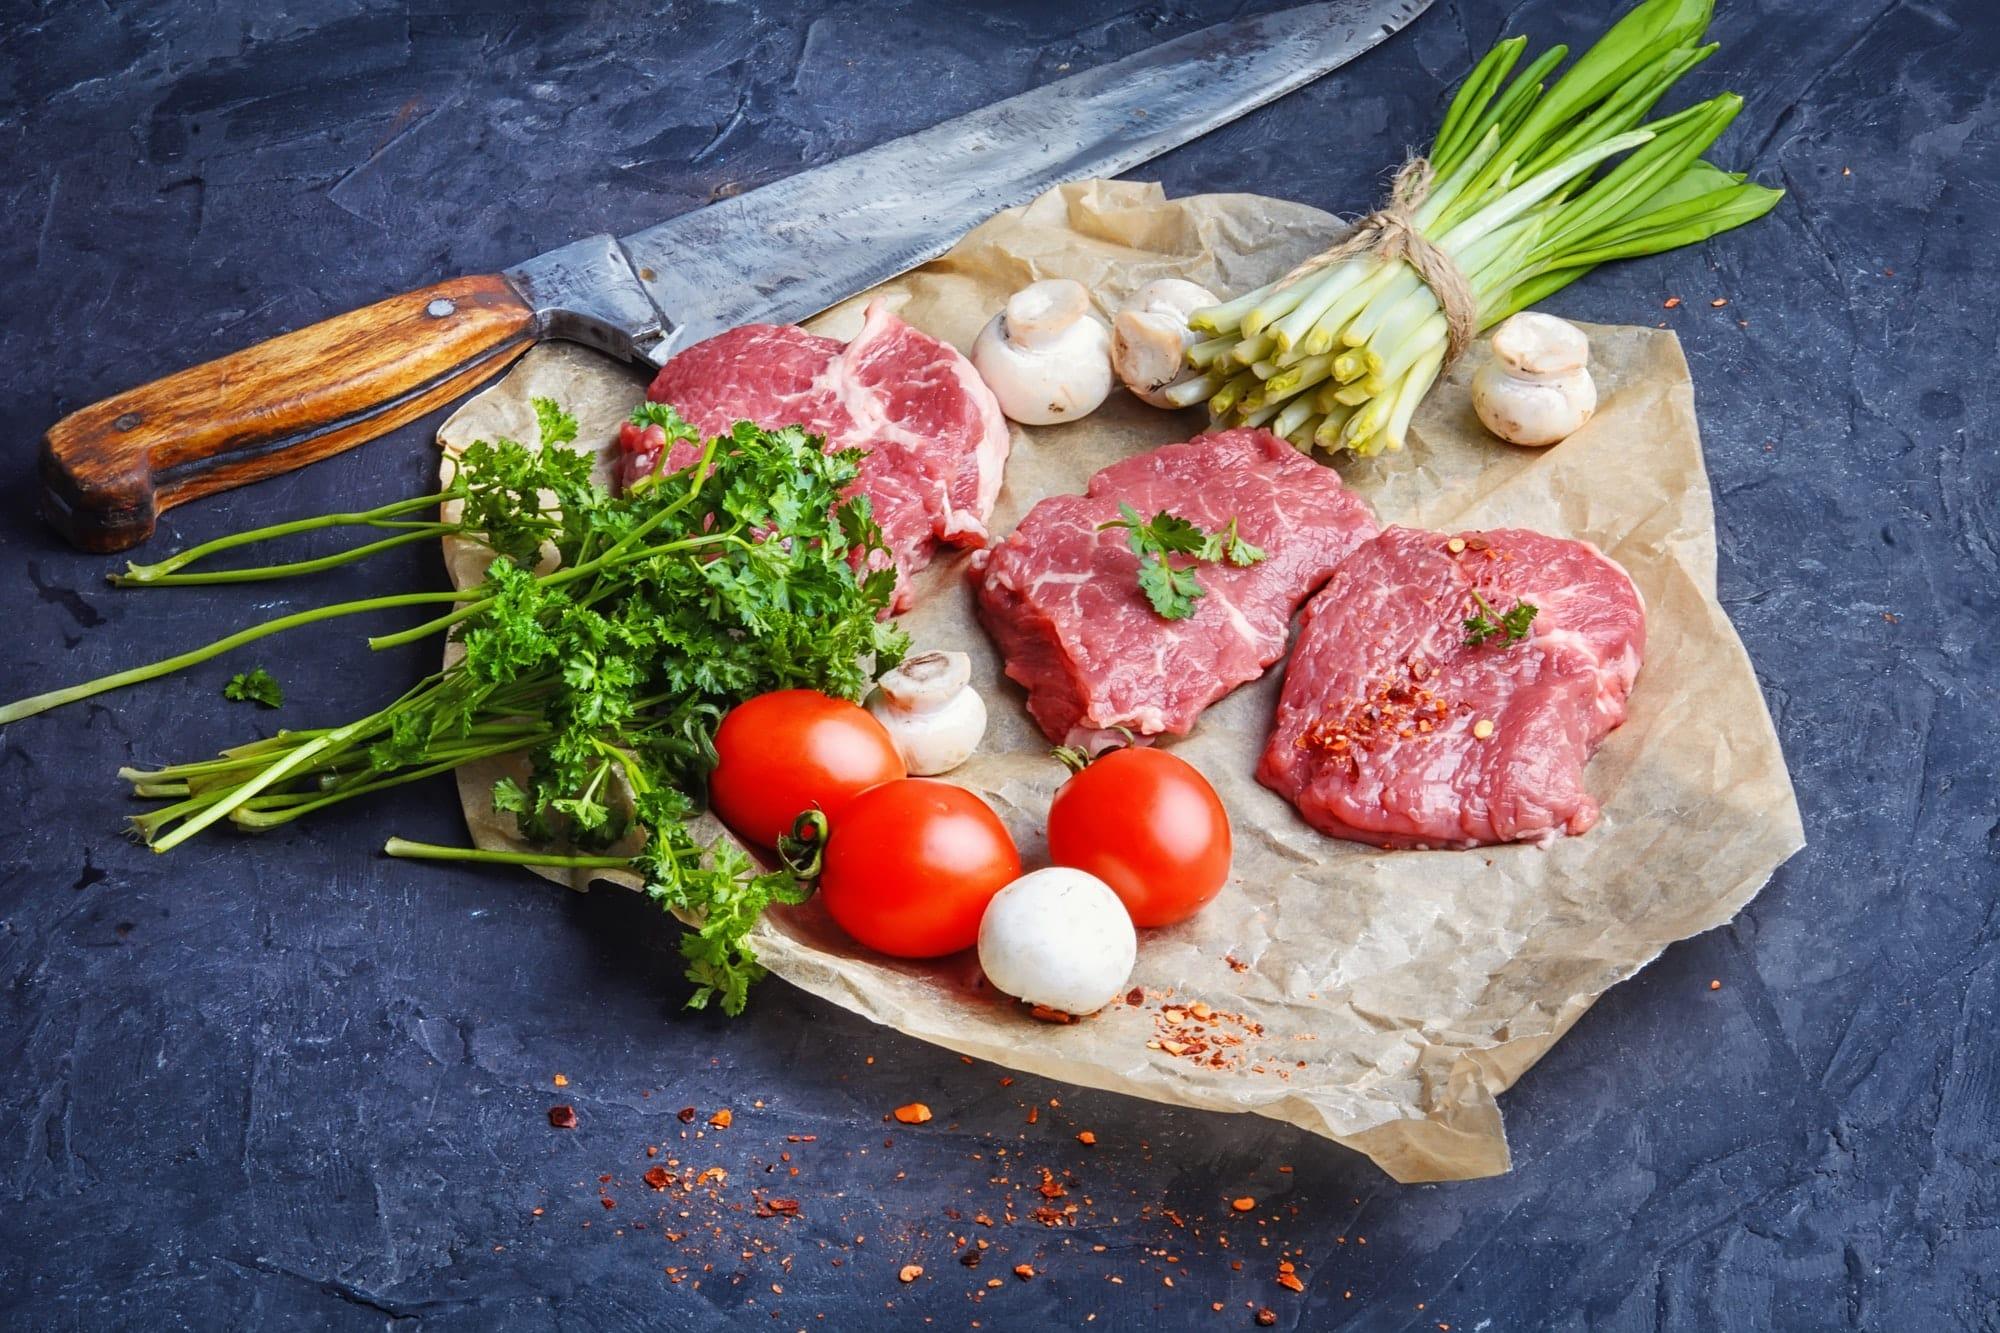 viande tomates et champignons